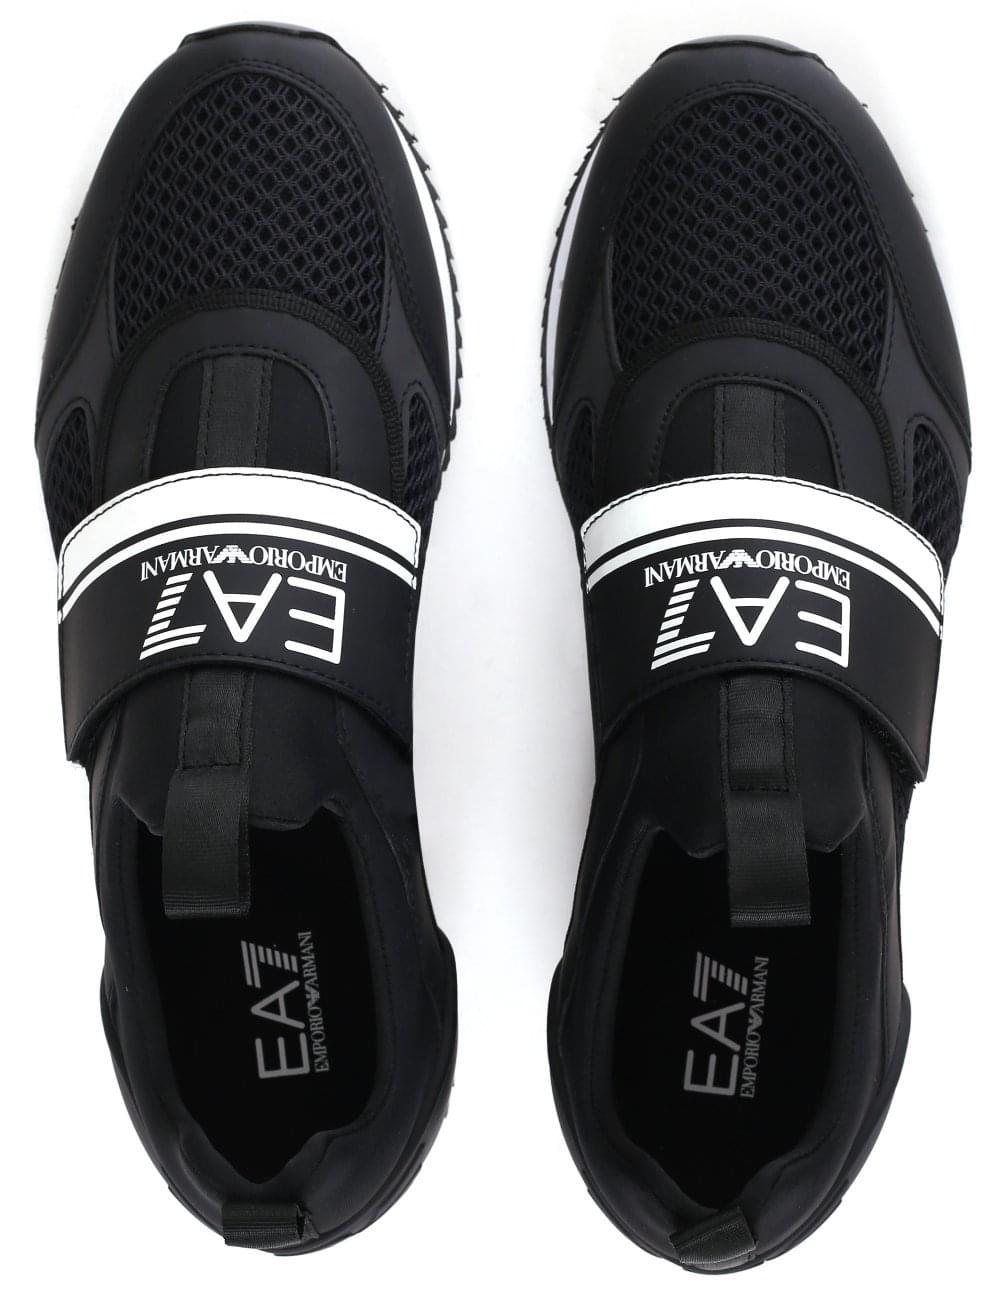 ea7 strap runner trainer, OFF 71%,Buy!